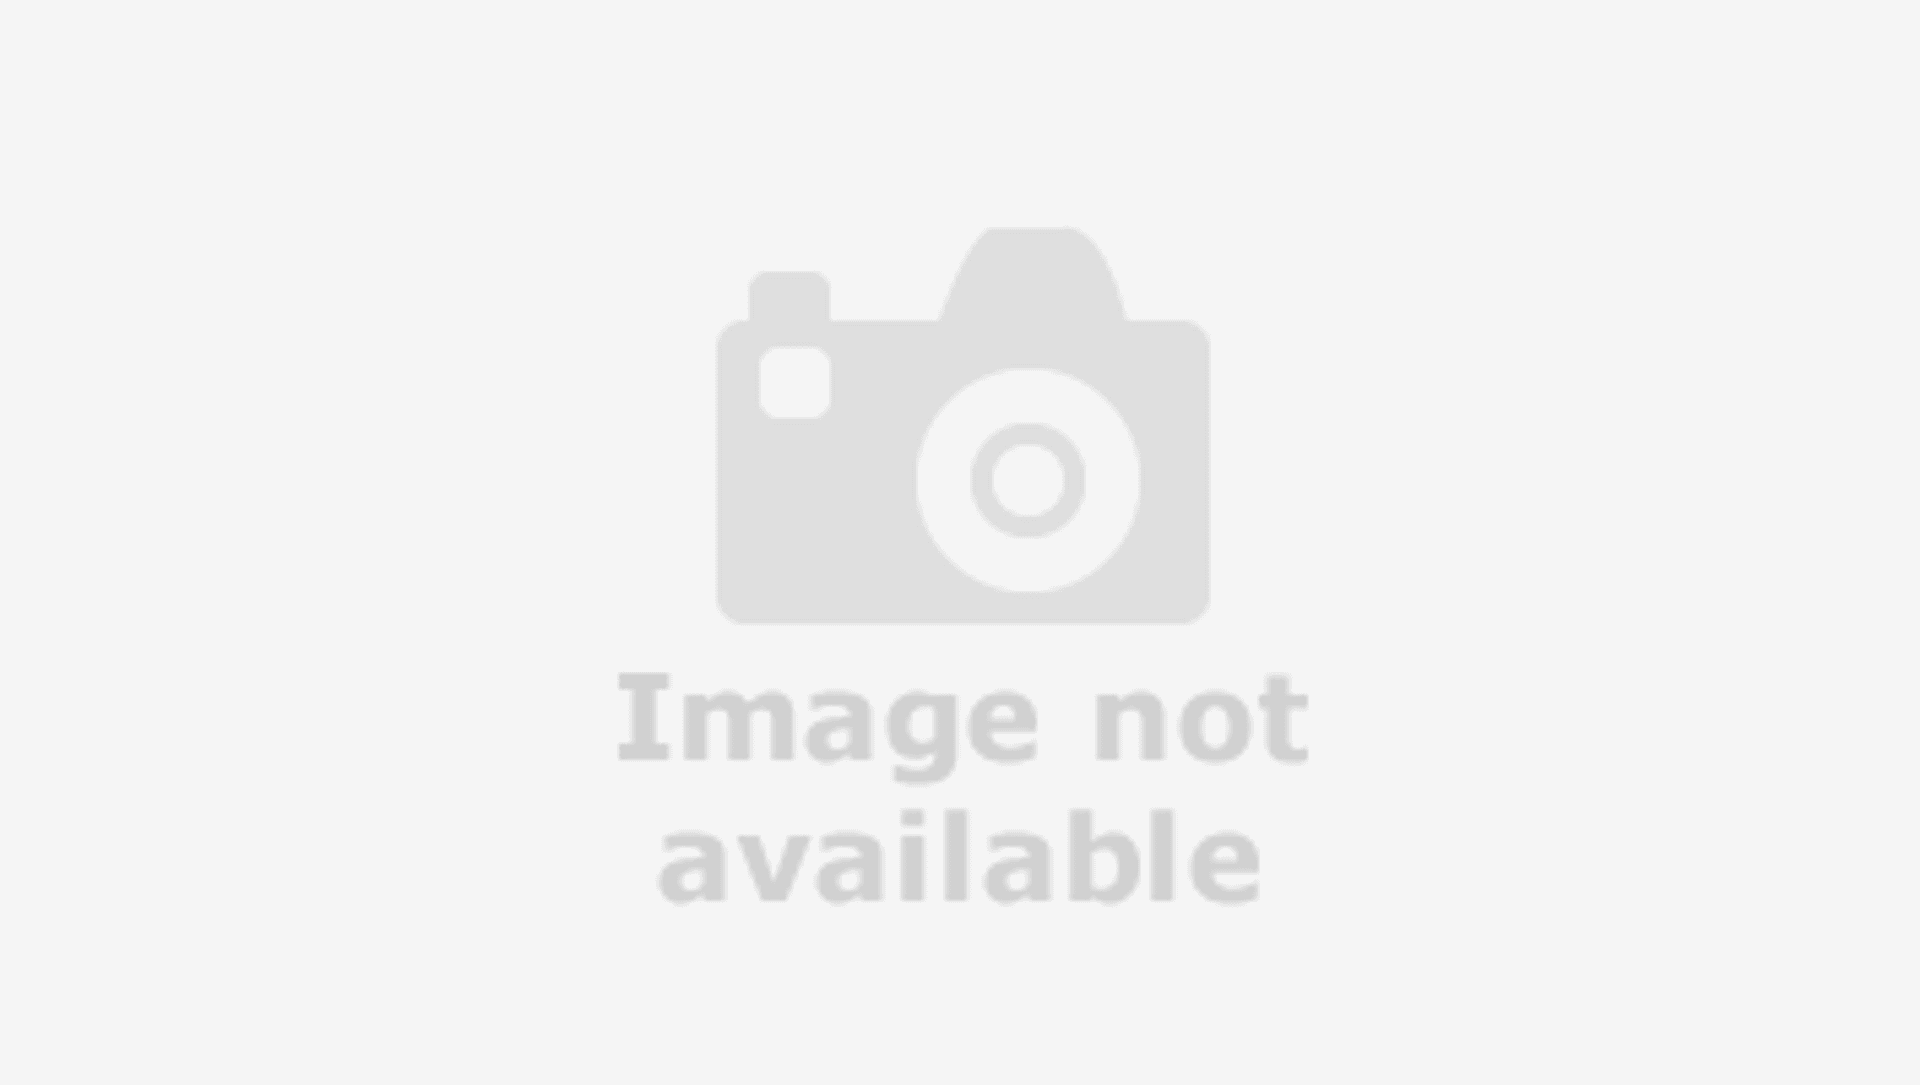 Audi Q5 Vorsprung Competition image